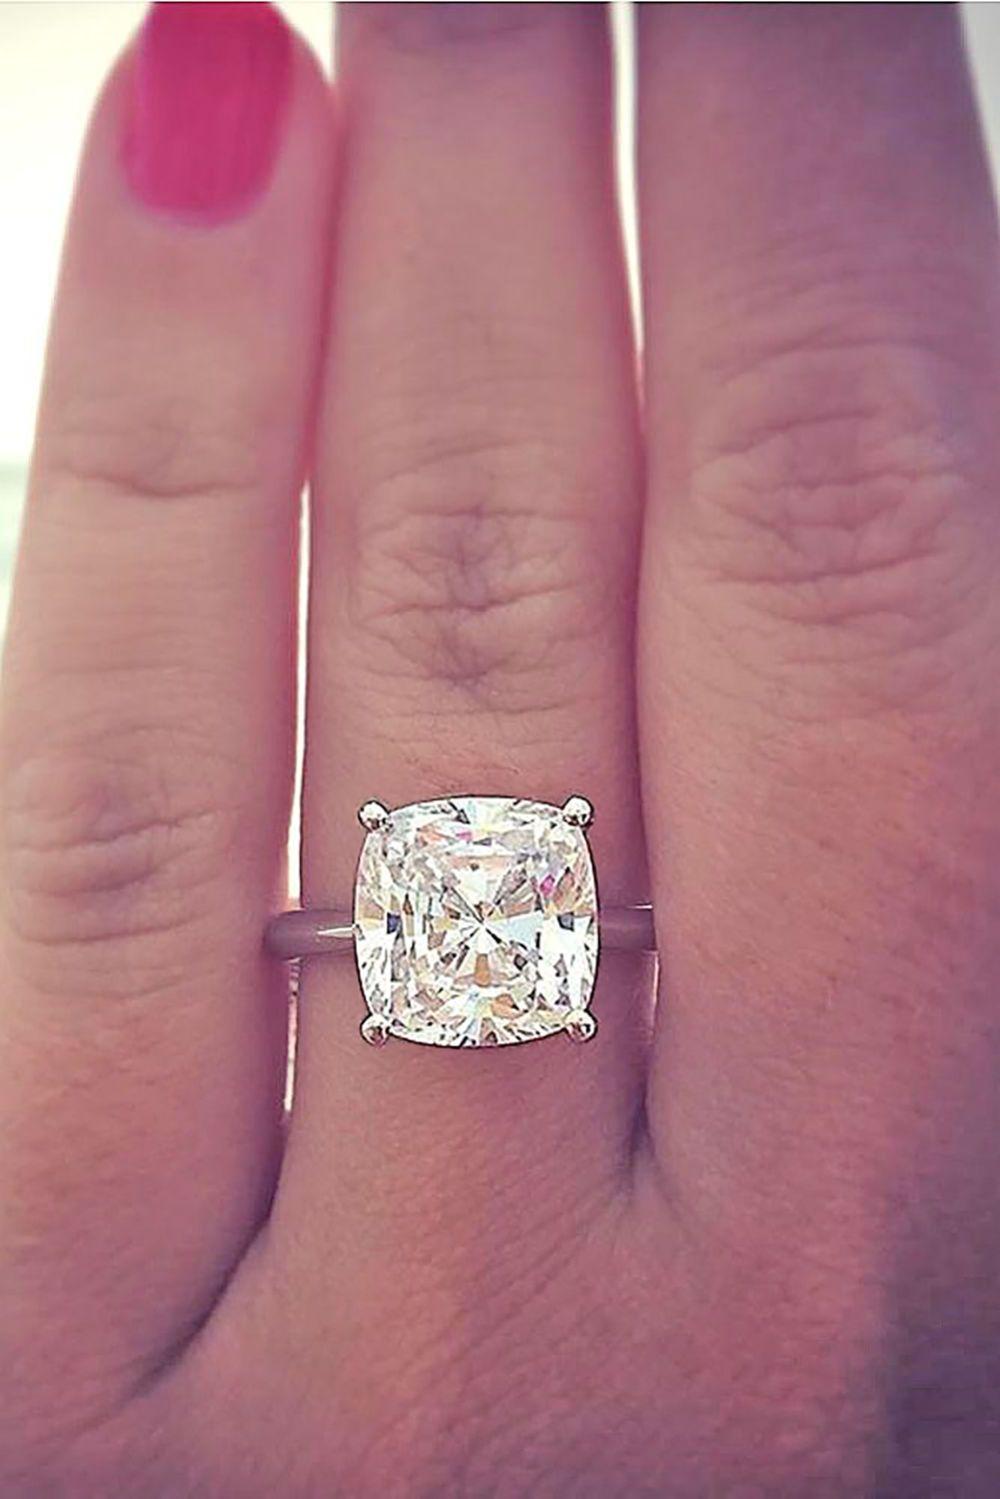 4 Carat Cushion Cut Diamond Engagement Ring Solitaire 14k White Gold ...